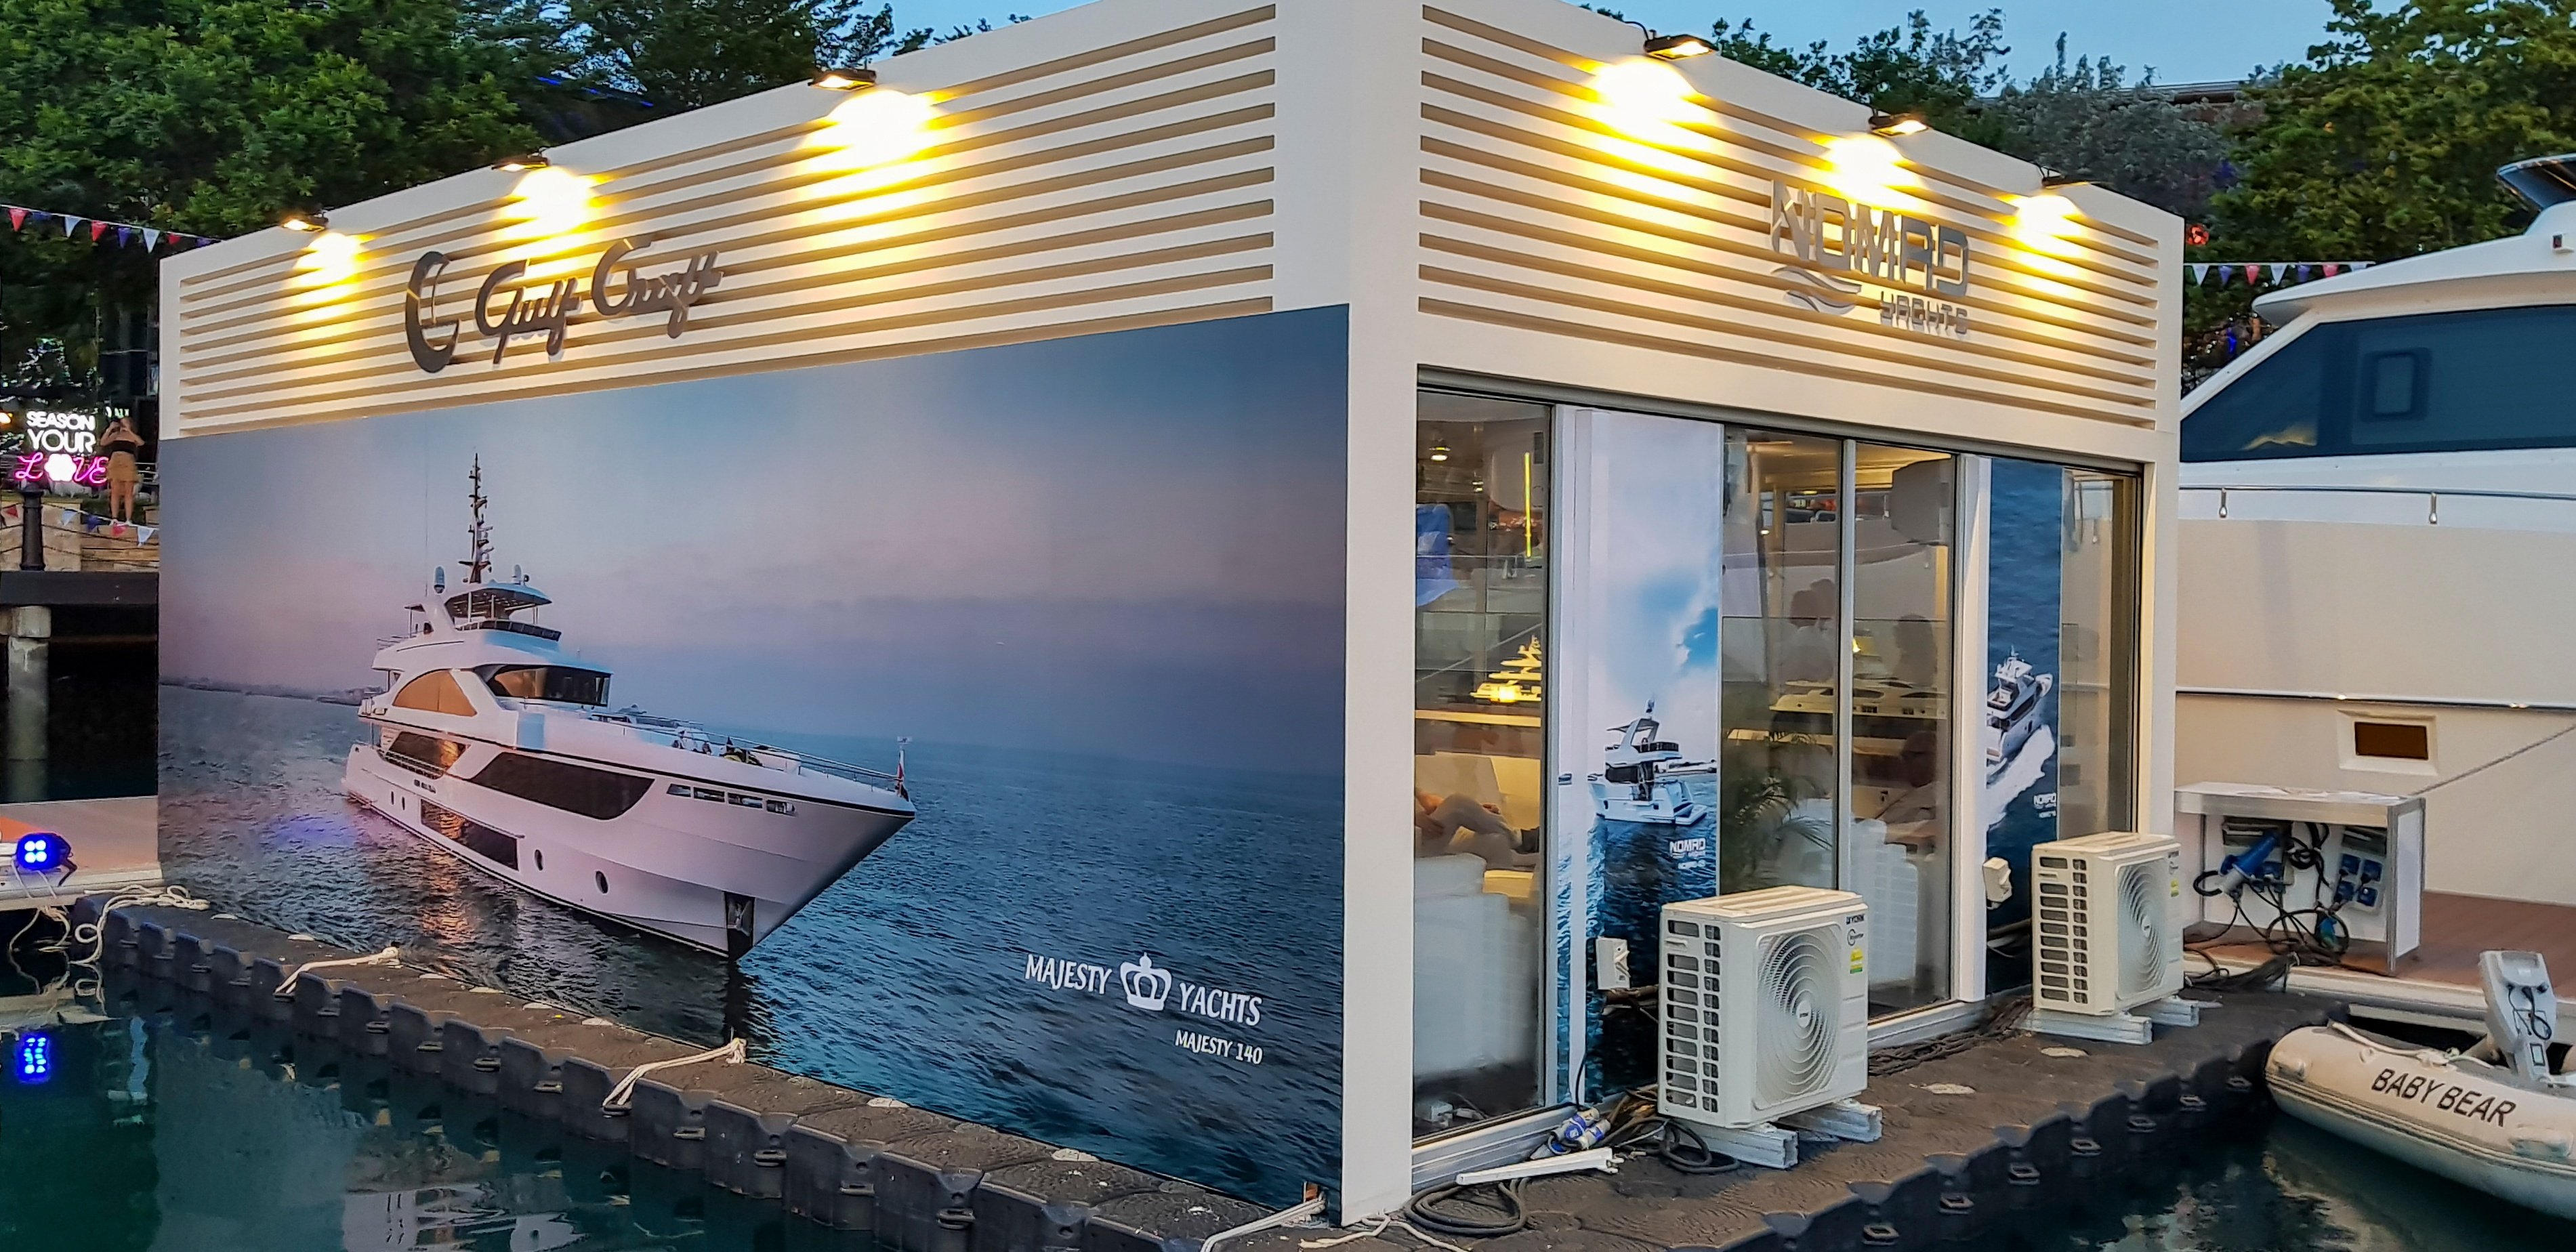 Gulf Craft at Singapore Yacht Show 2018 Day 1 (13).jpg